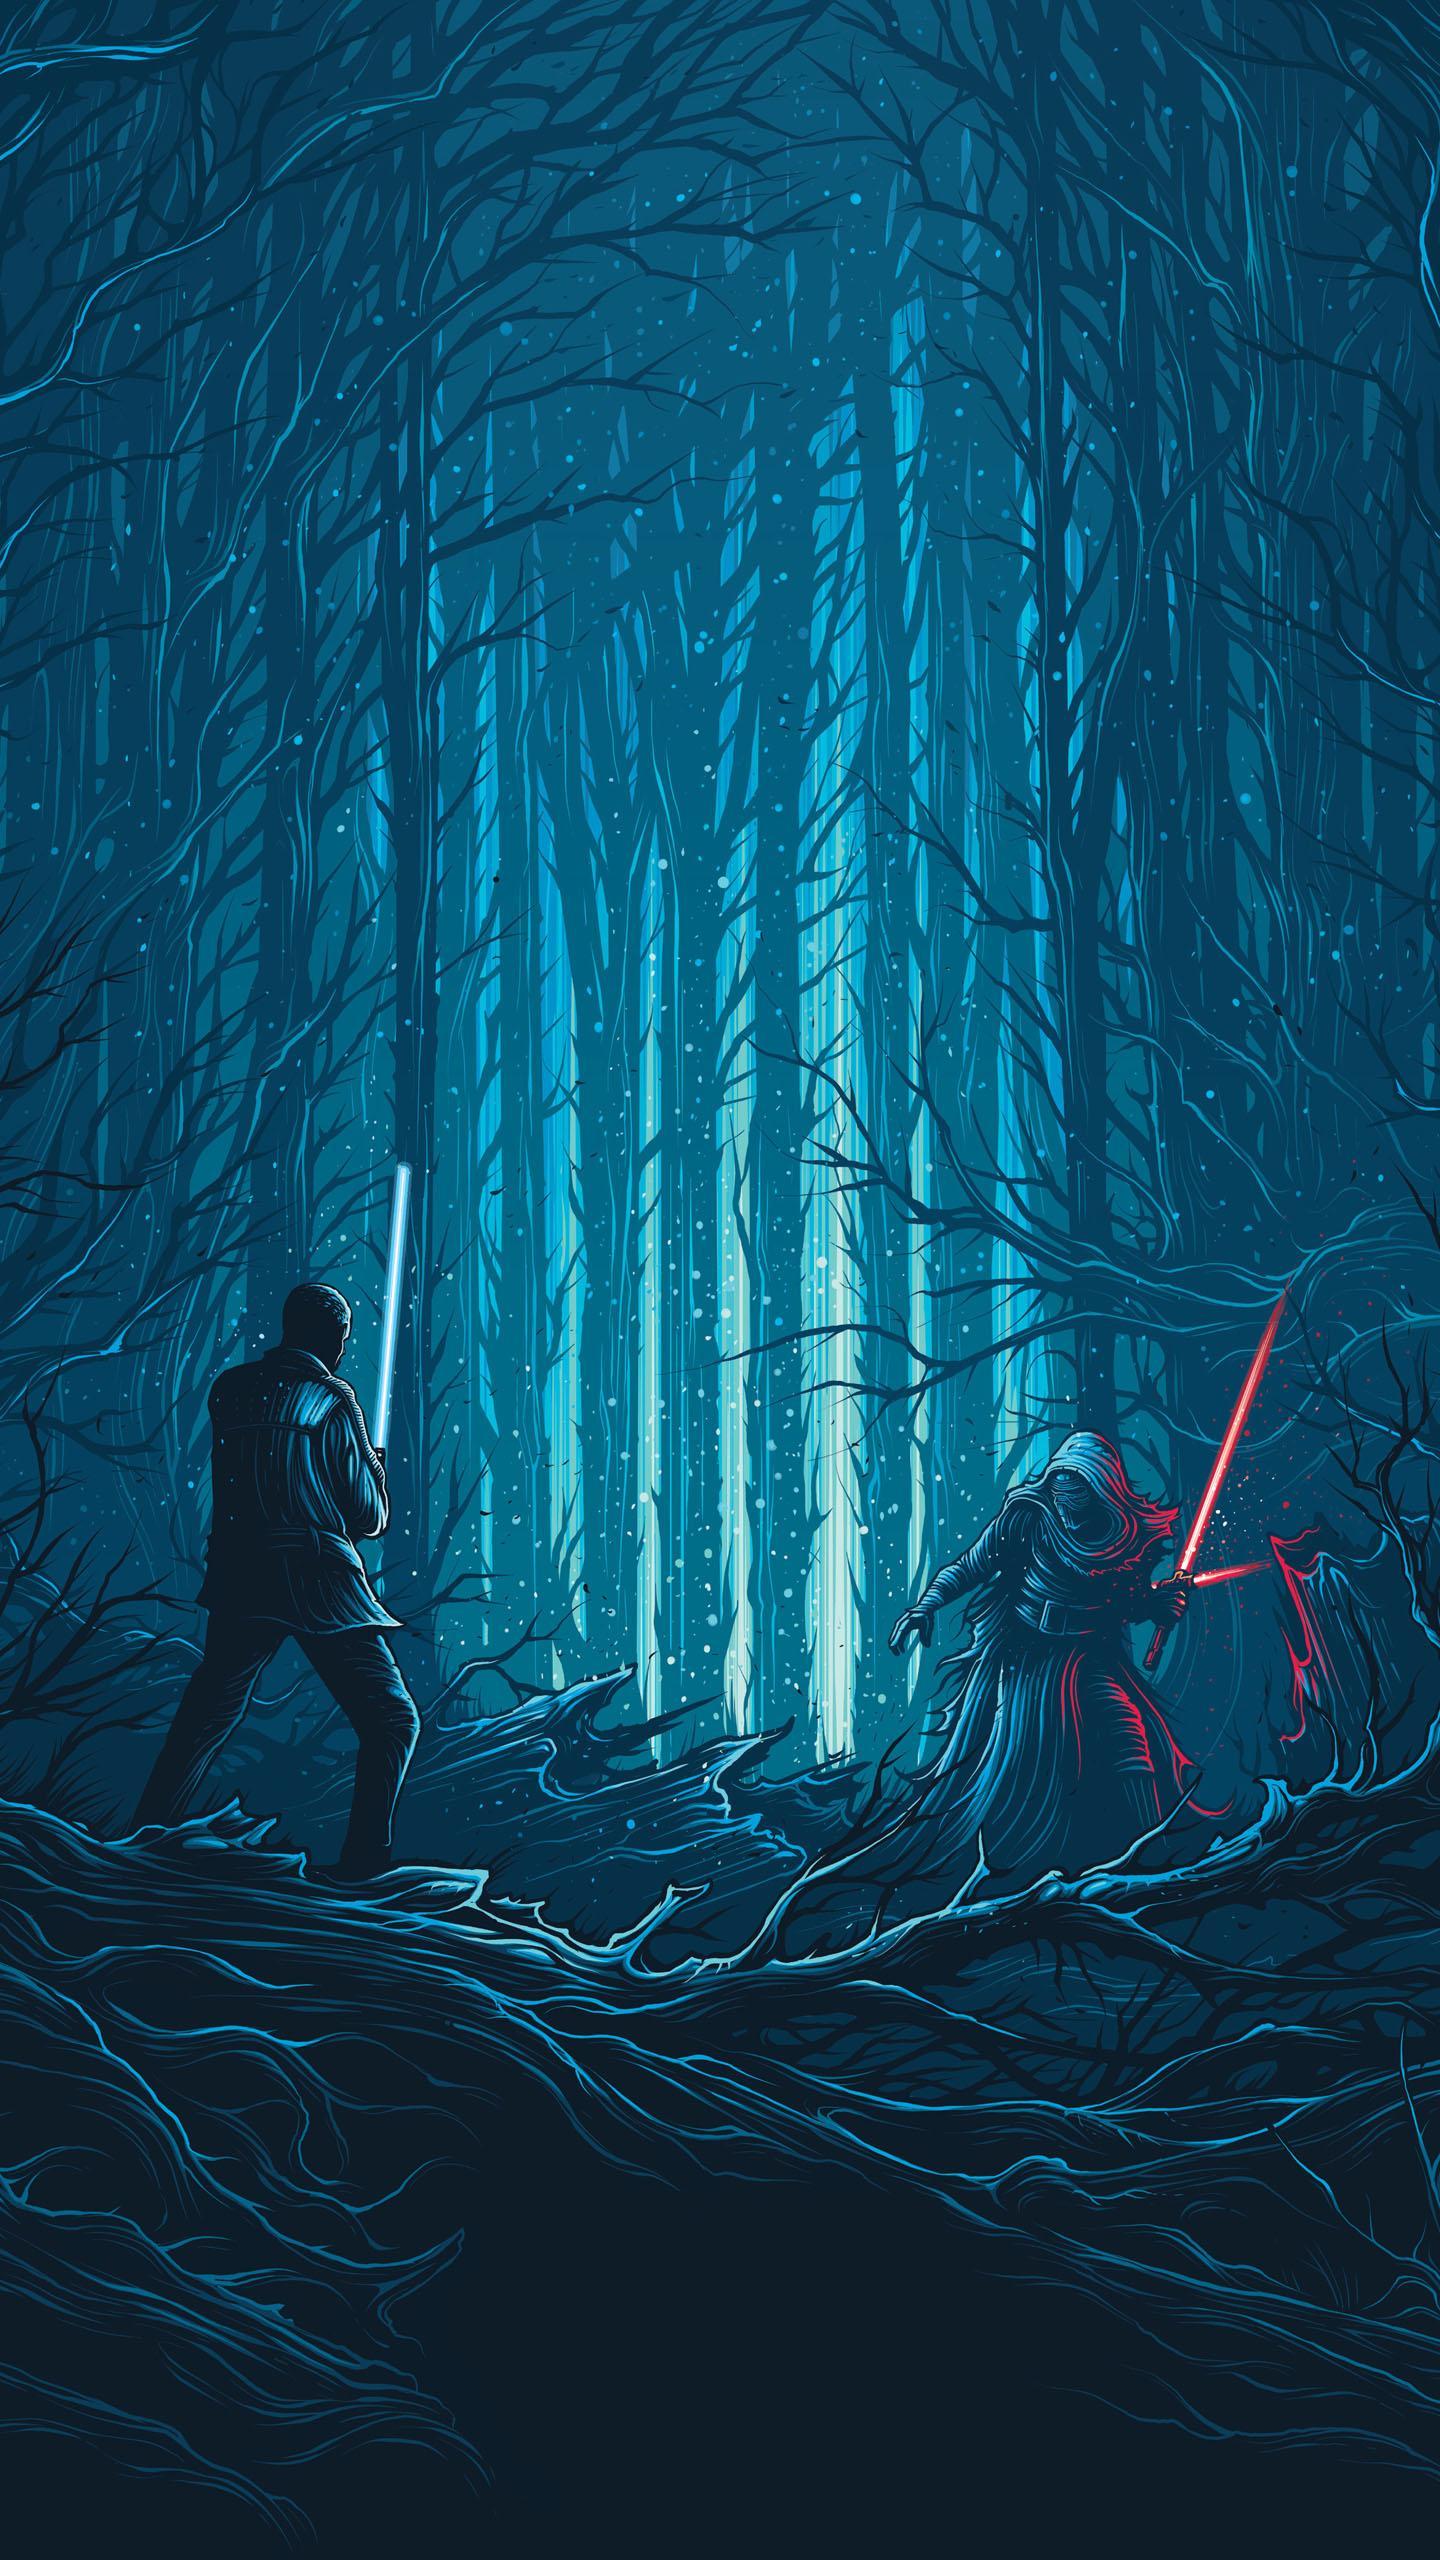 Star Wars Phone Wallpapers Wallpaper Cave